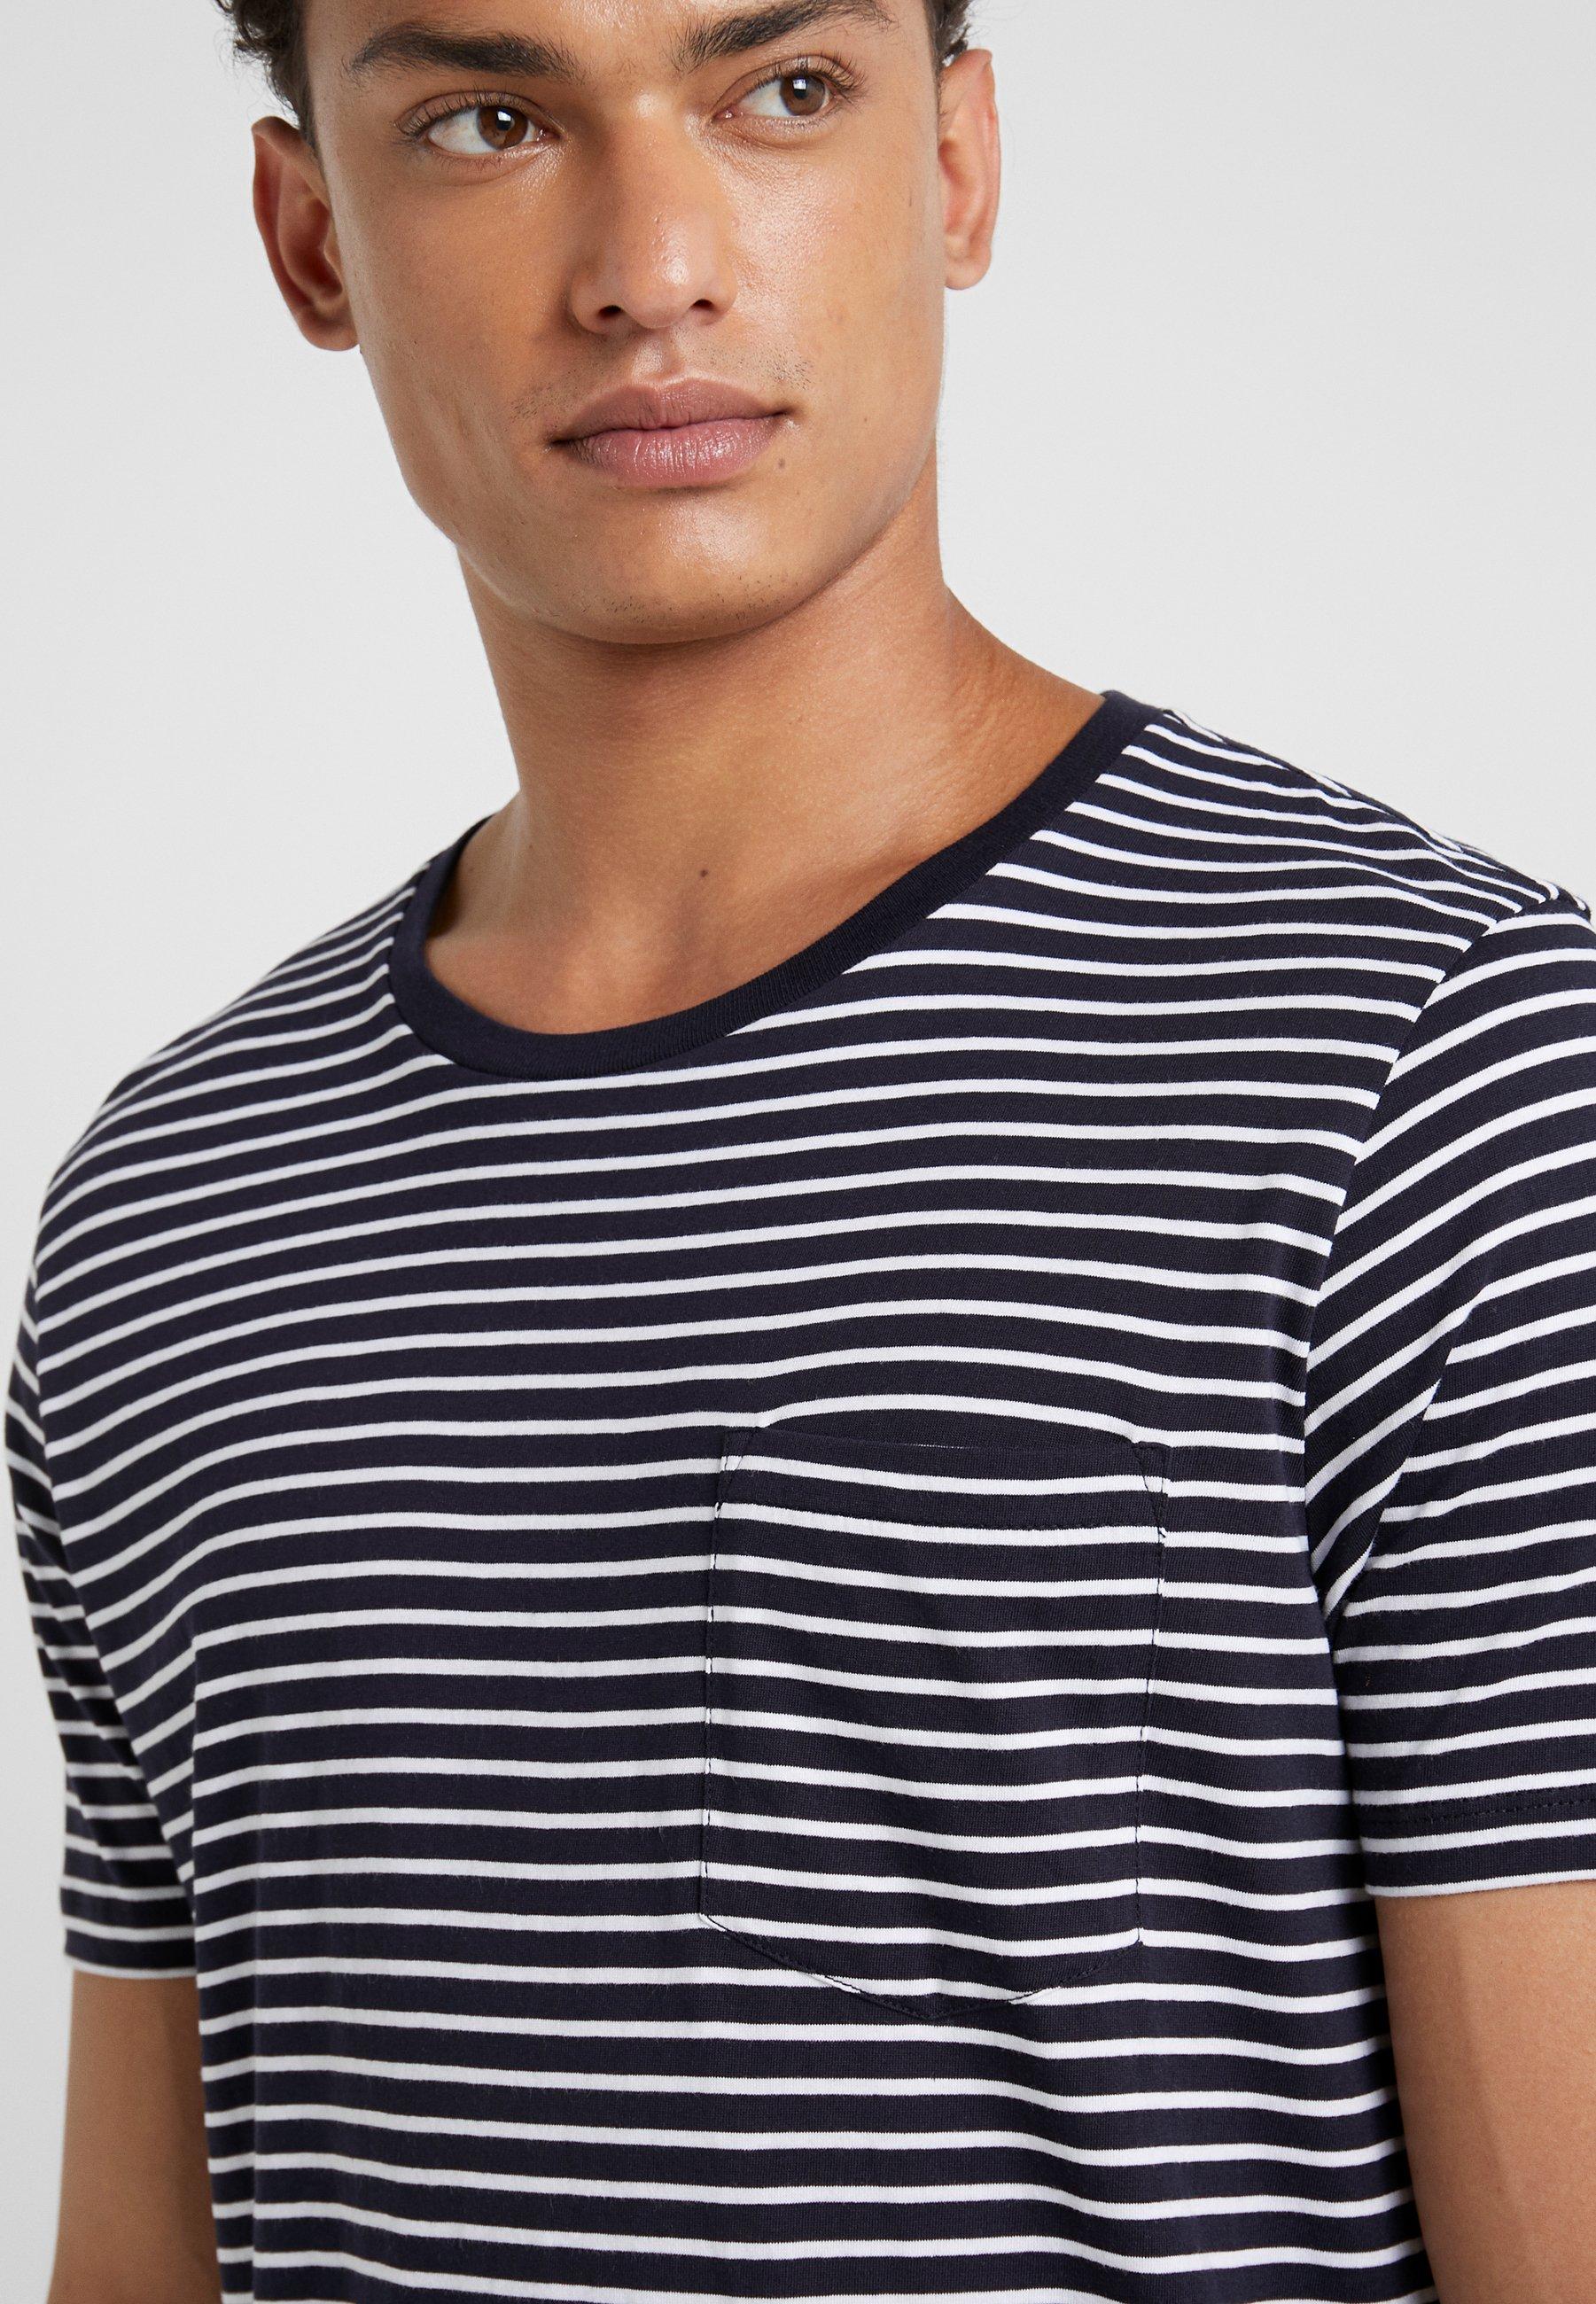 Club TeeT white Navy Williams shirt Stampa Con Monaco PTwOXZuik